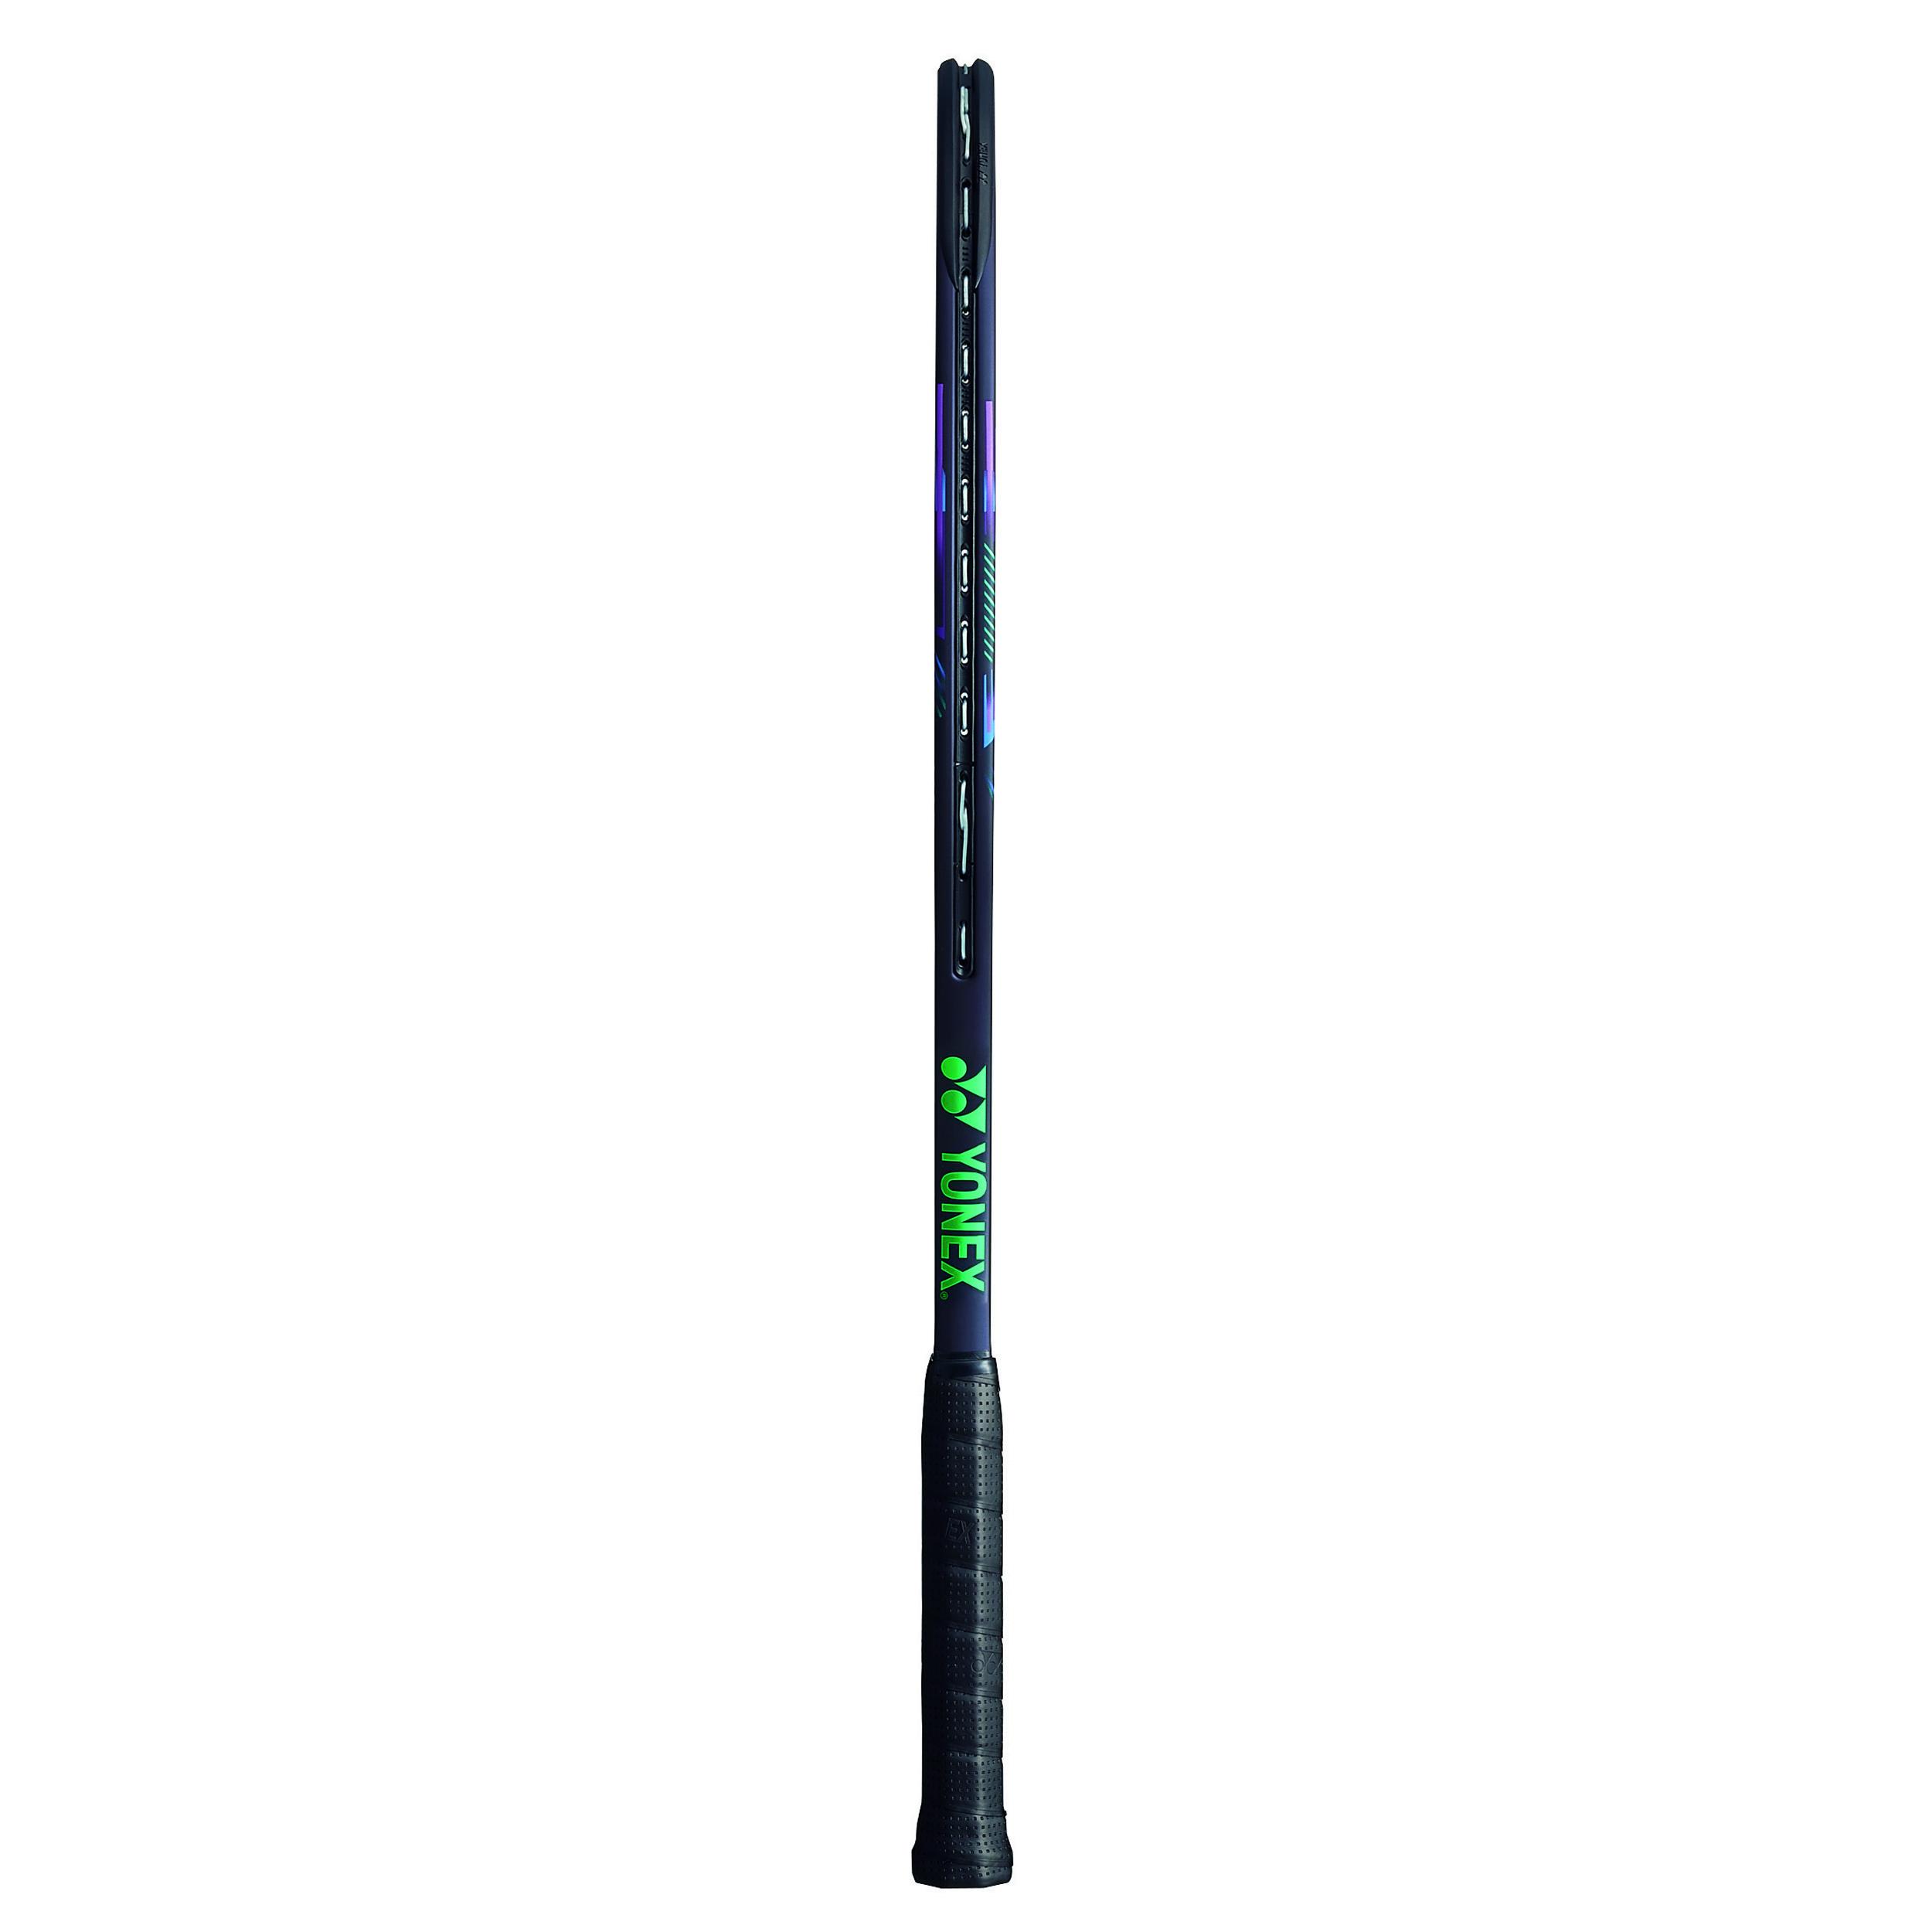 Yonex Vcore Pro 97H 330g Tennis Racquet 2021